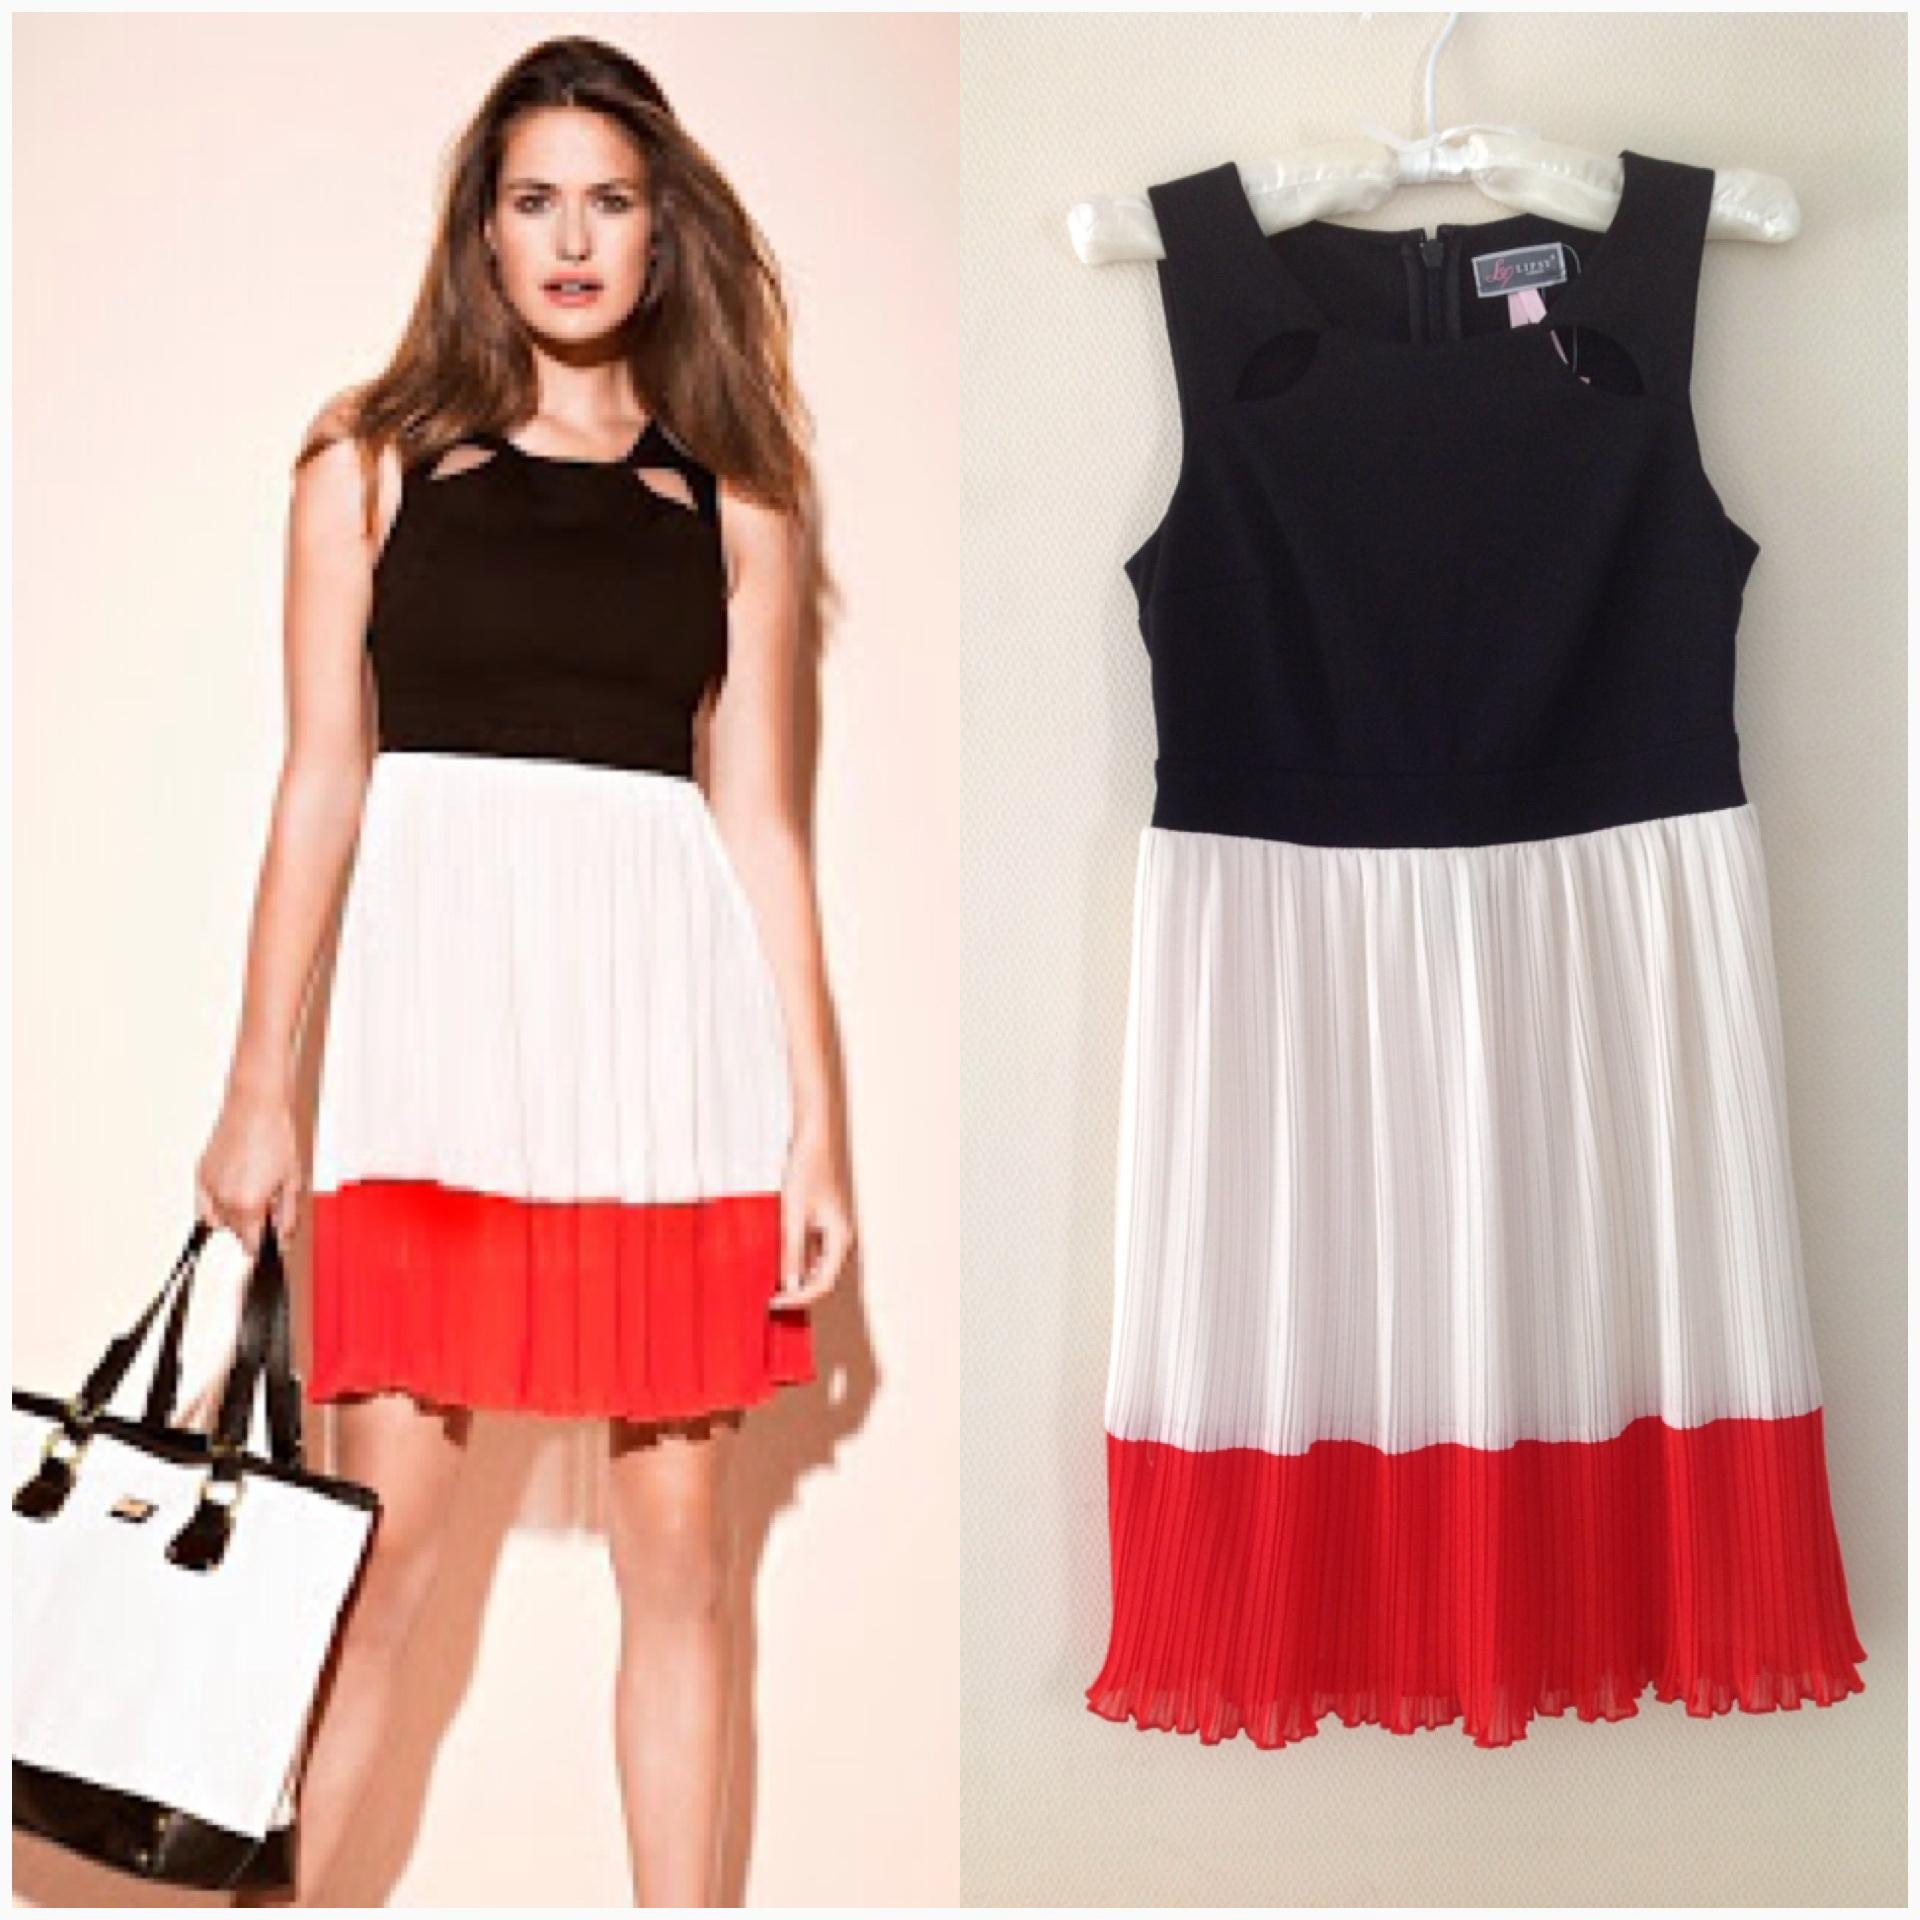 Lipsy Dress Size Uk 10=1 Uk12=1